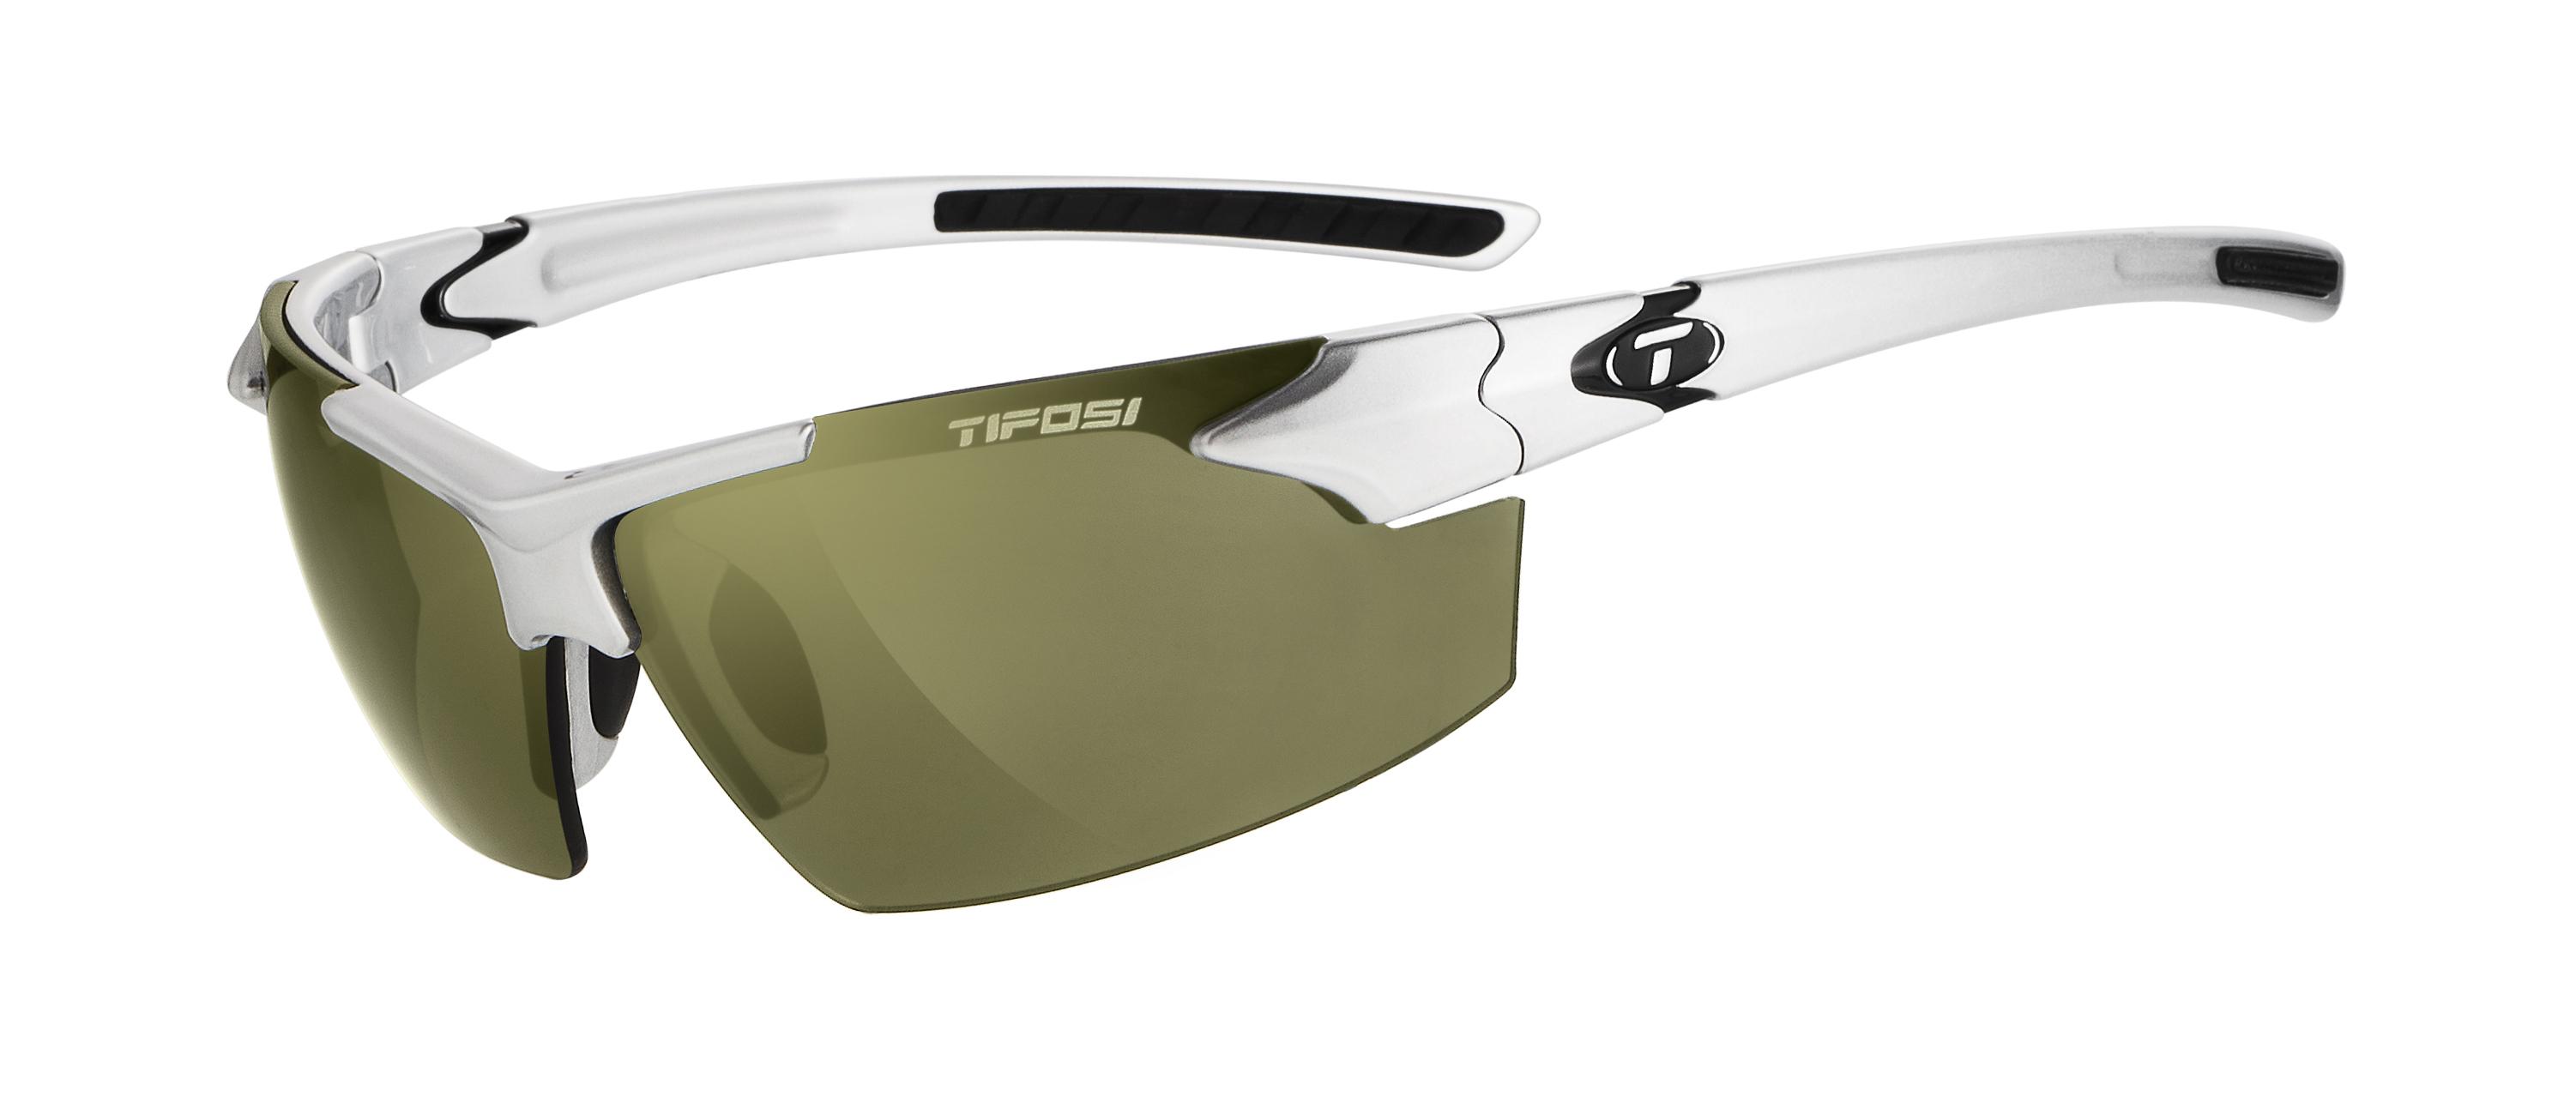 Tifosi Jet FC Metallic Silver GT Lens